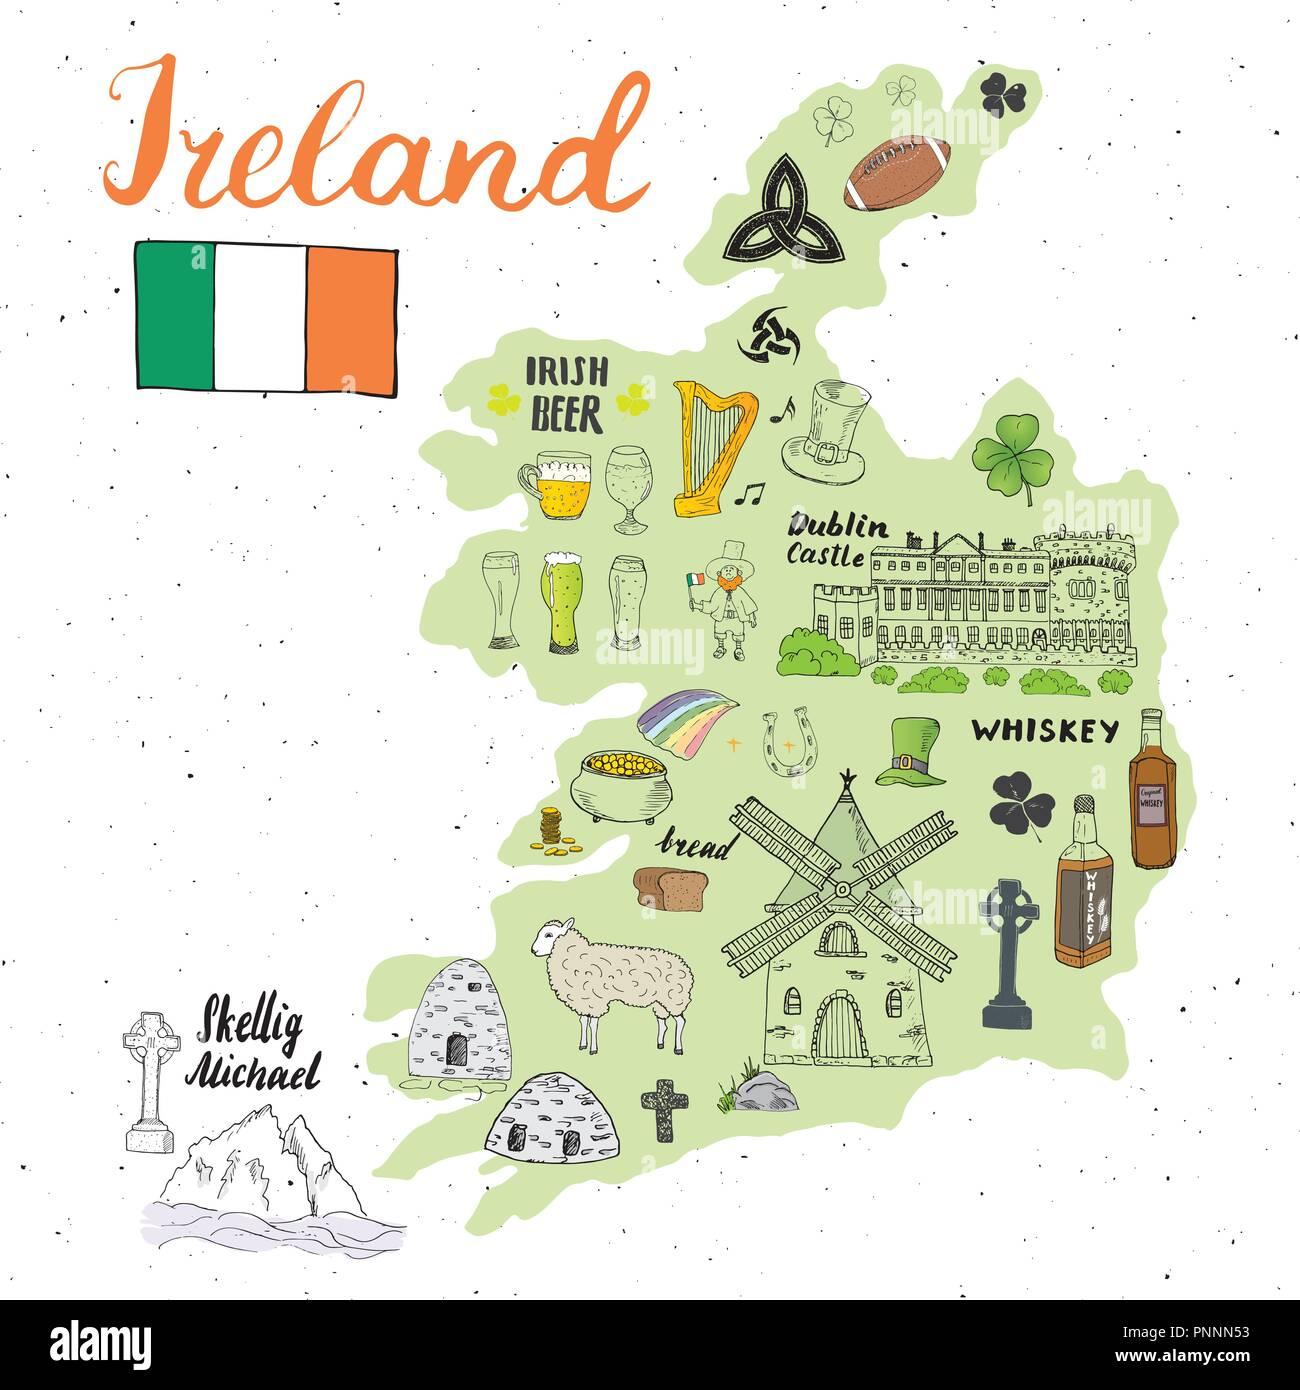 Map Of Ireland In Irish.Ireland Sketch Doodles Hand Drawn Irish Elements Set With Flag And